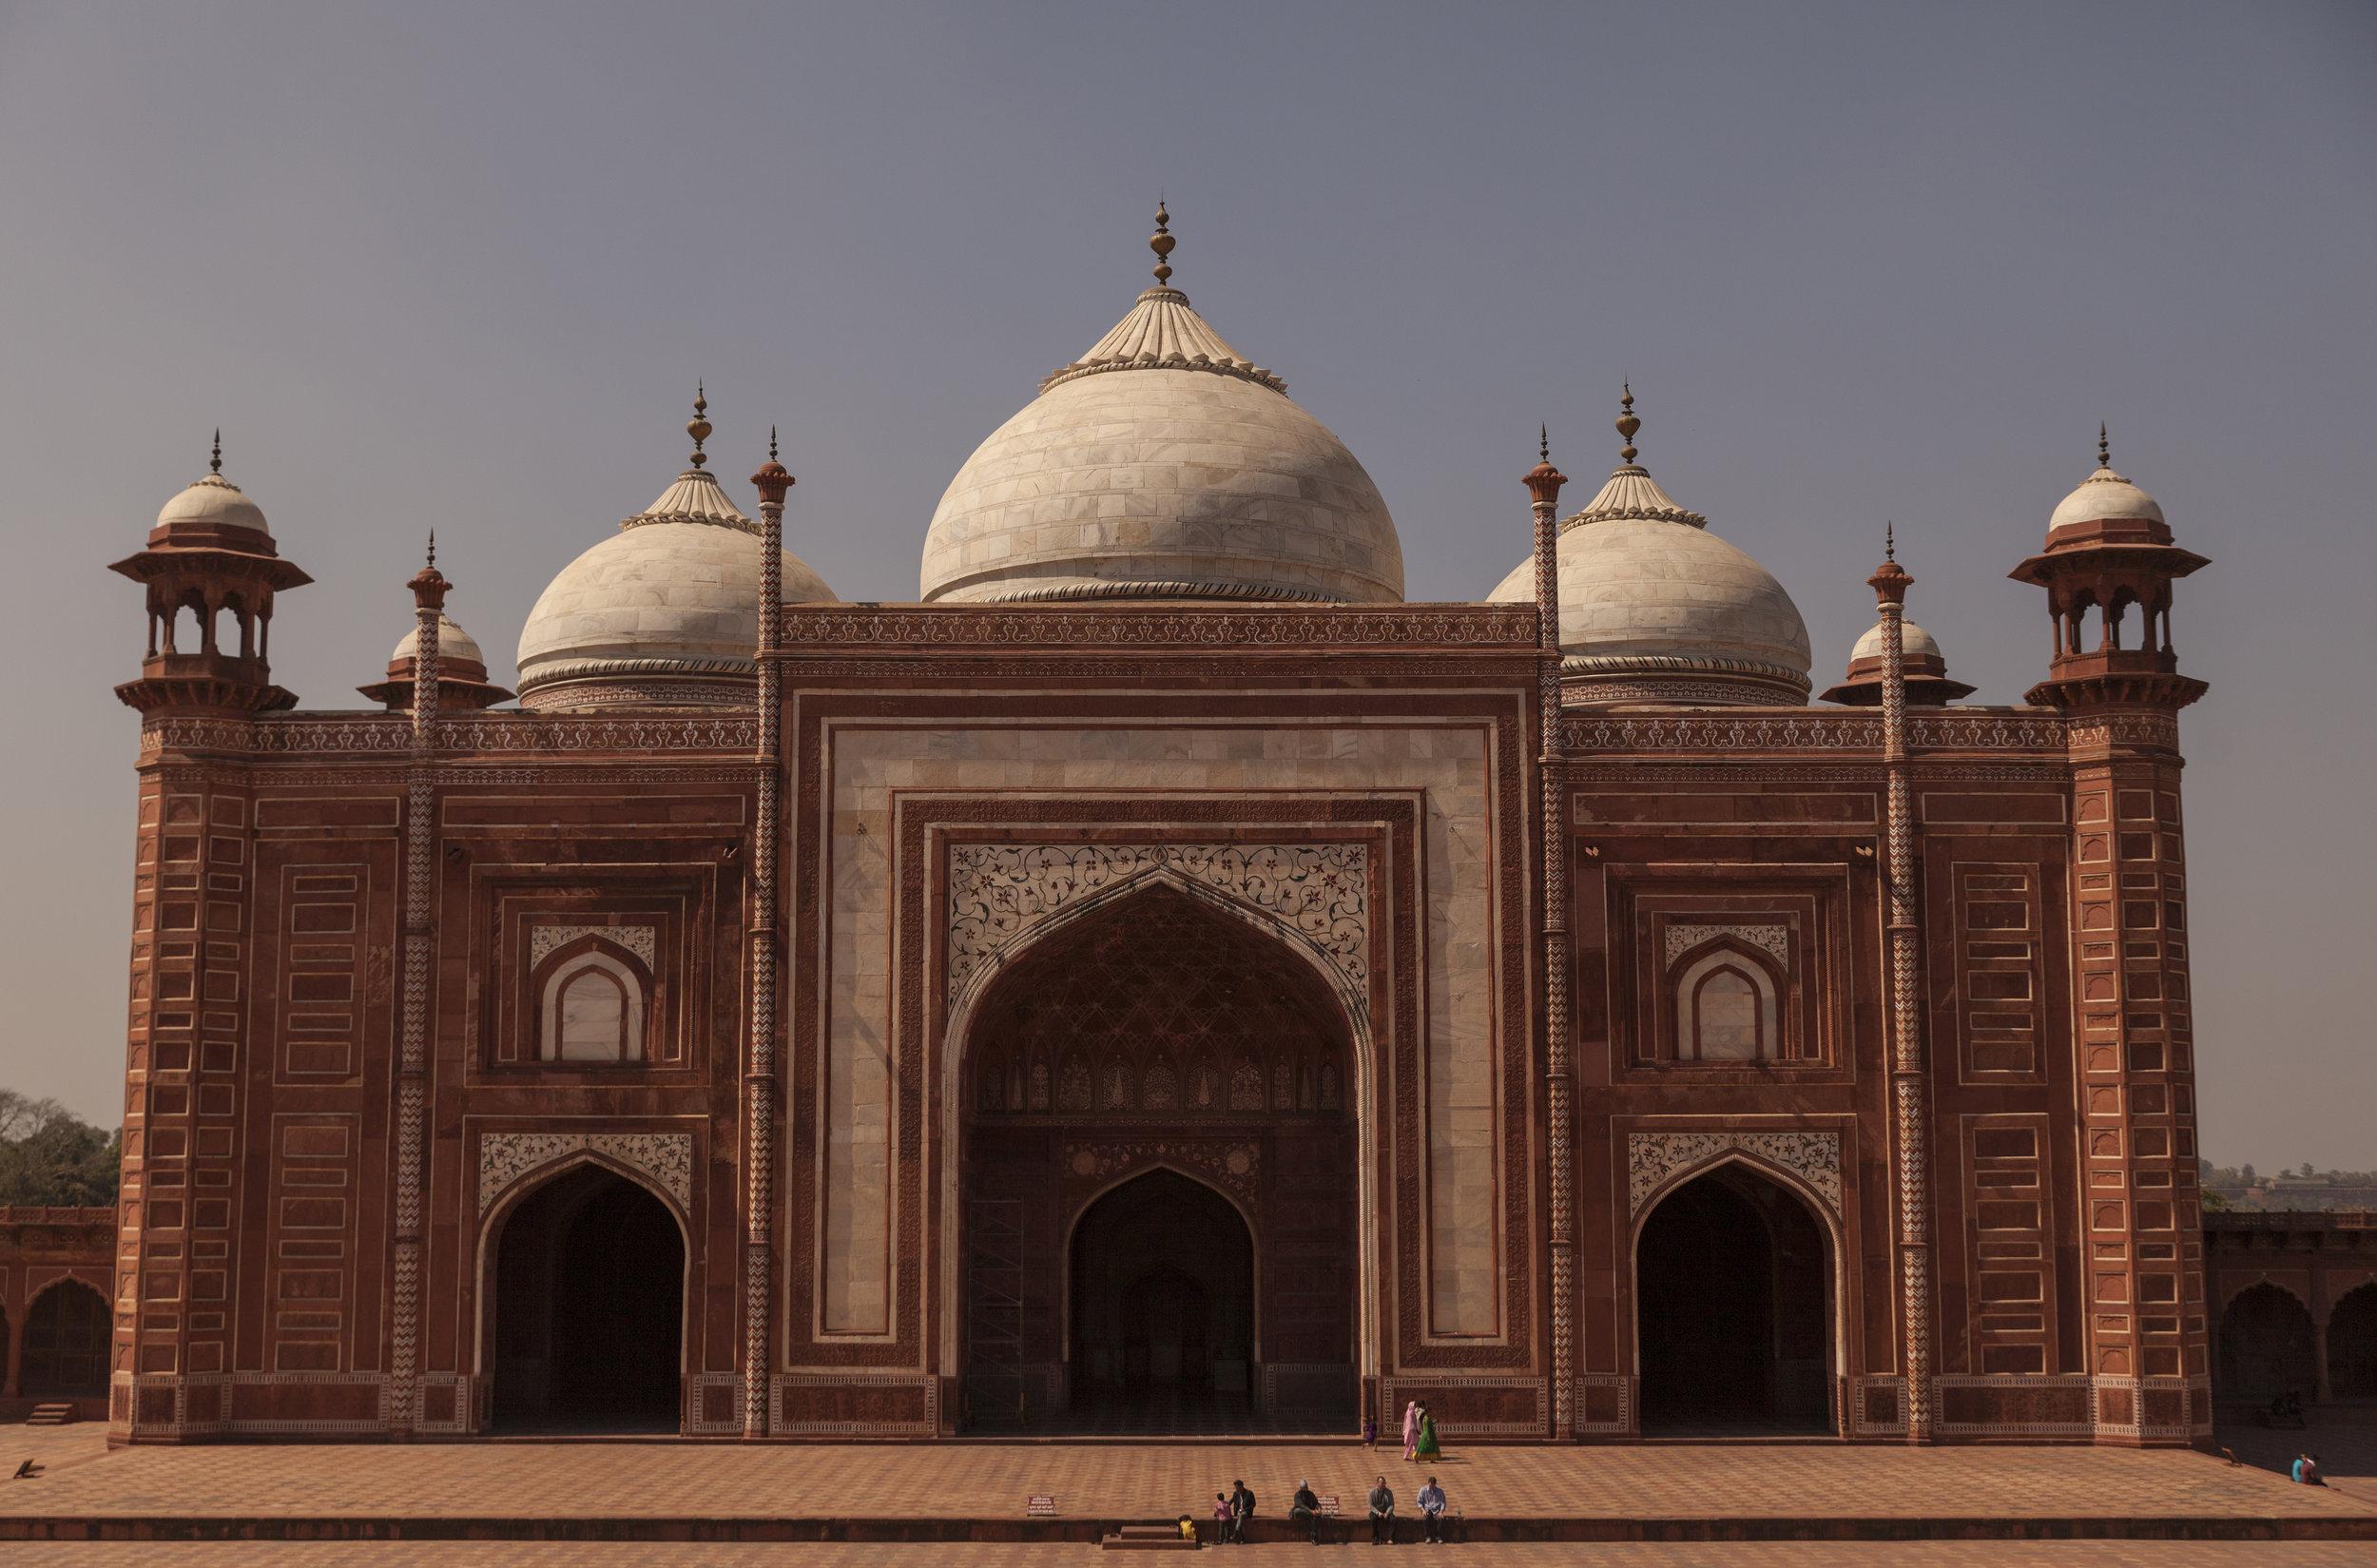 India_6656_photo_credit_Amanda_Ratliff (1).jpg